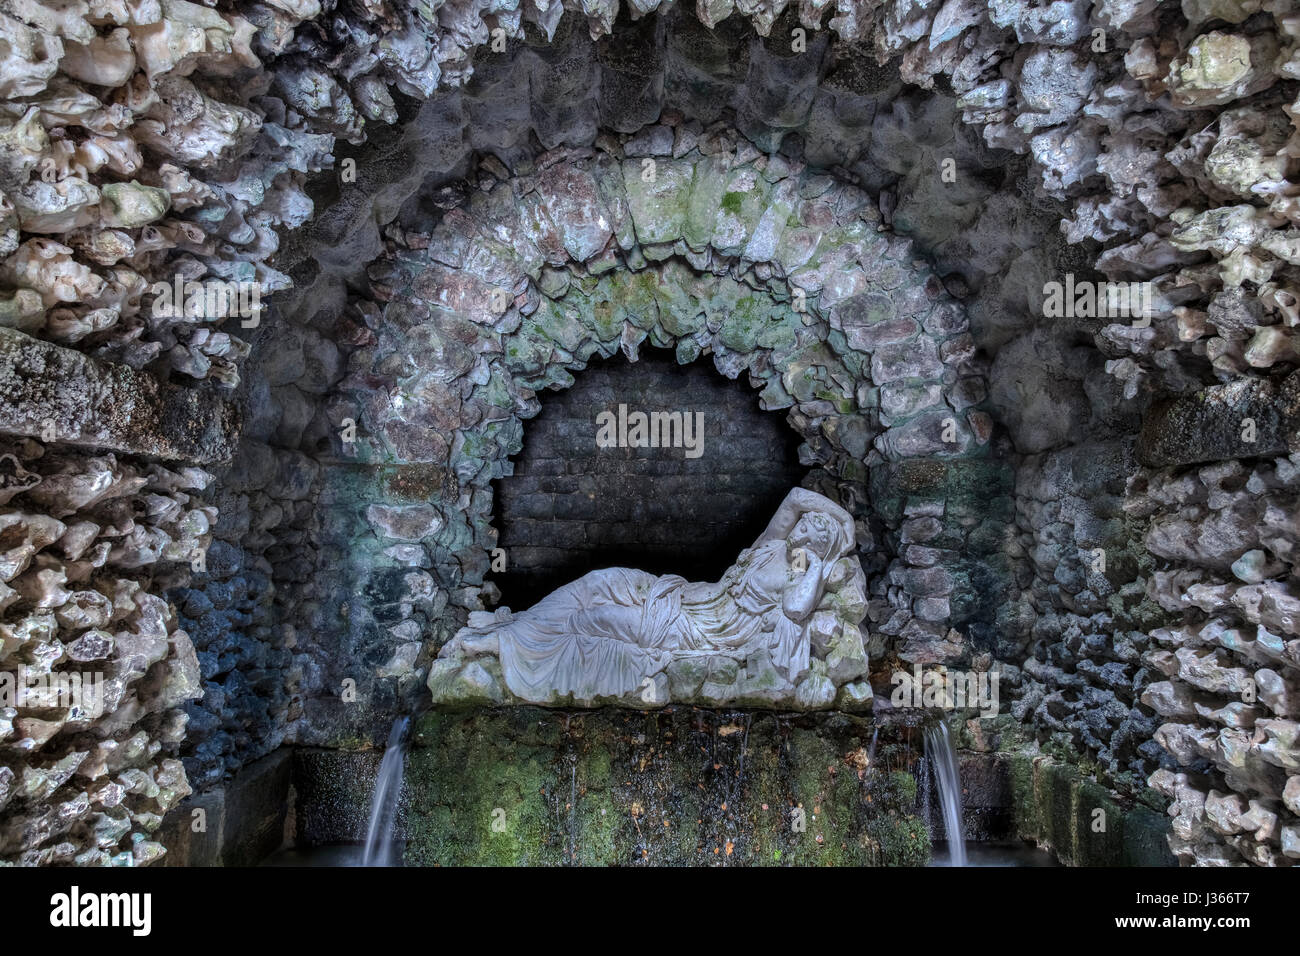 Estatua de un nymphe en una cueva Foto de stock